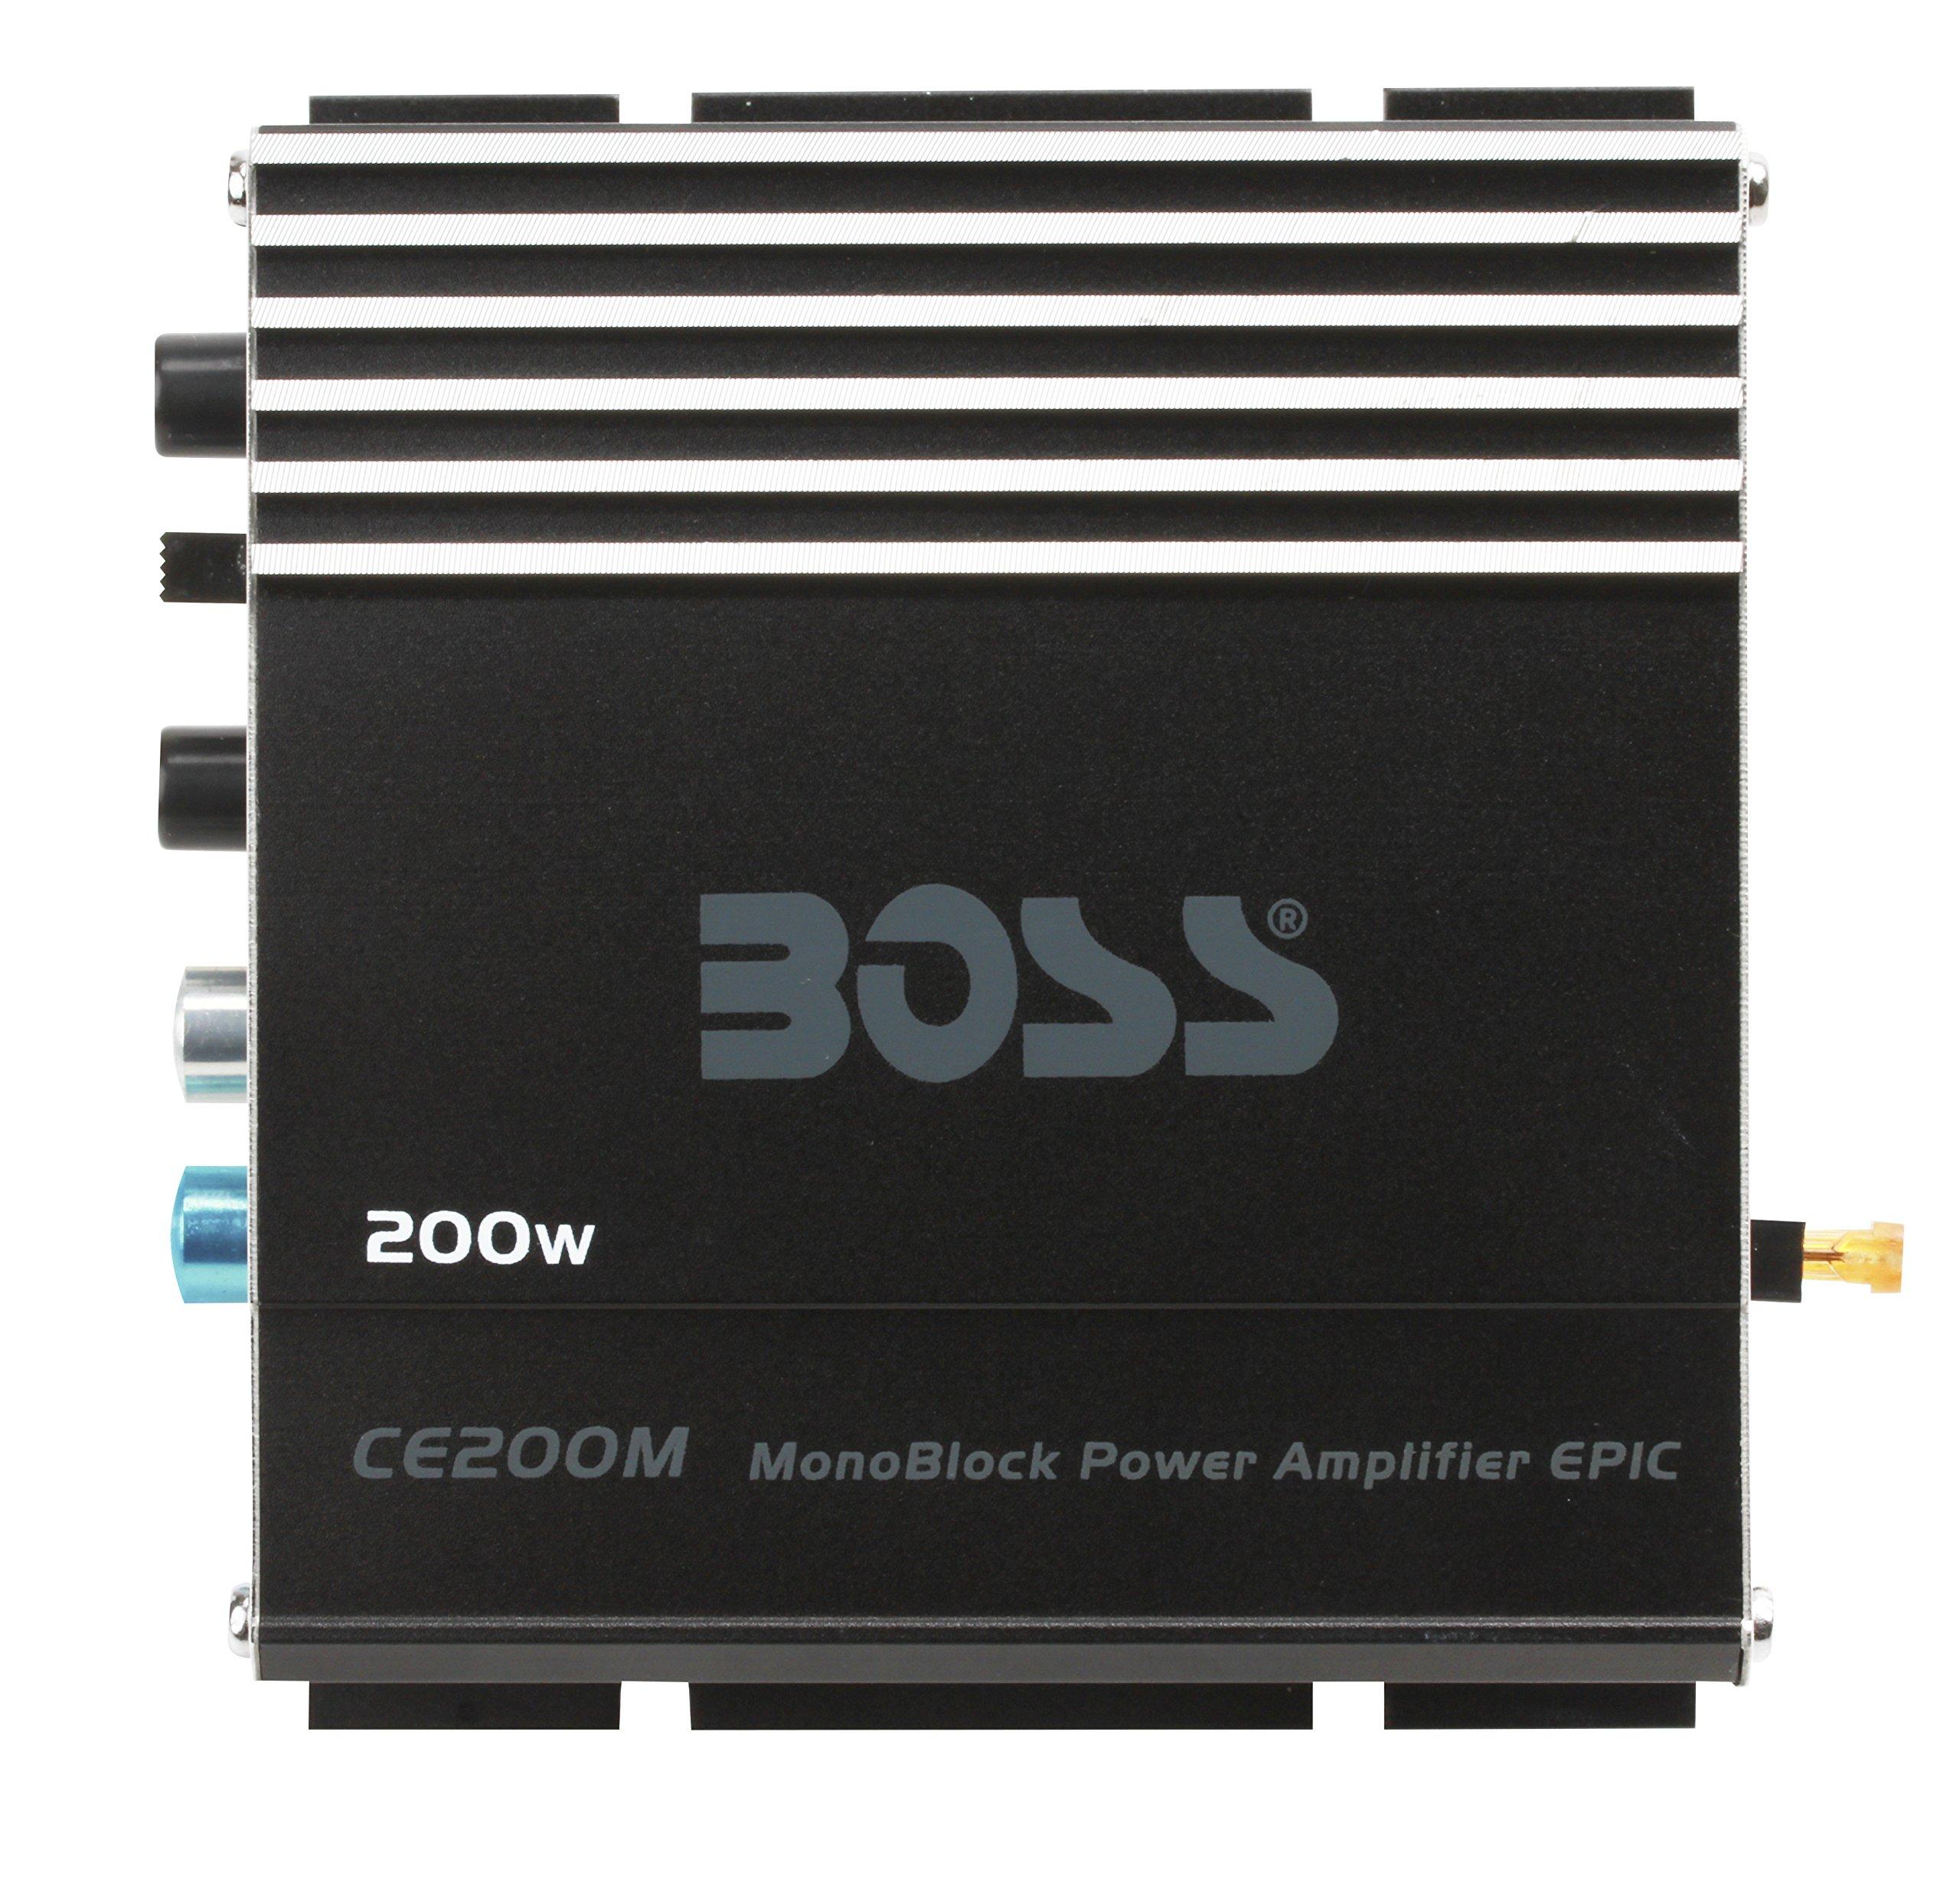 BOSS Audio CE200M Chaos Epic 200 Watt, Monoblock, 4 Ohm Stable Class A/B, MOSFET Car Amplifier